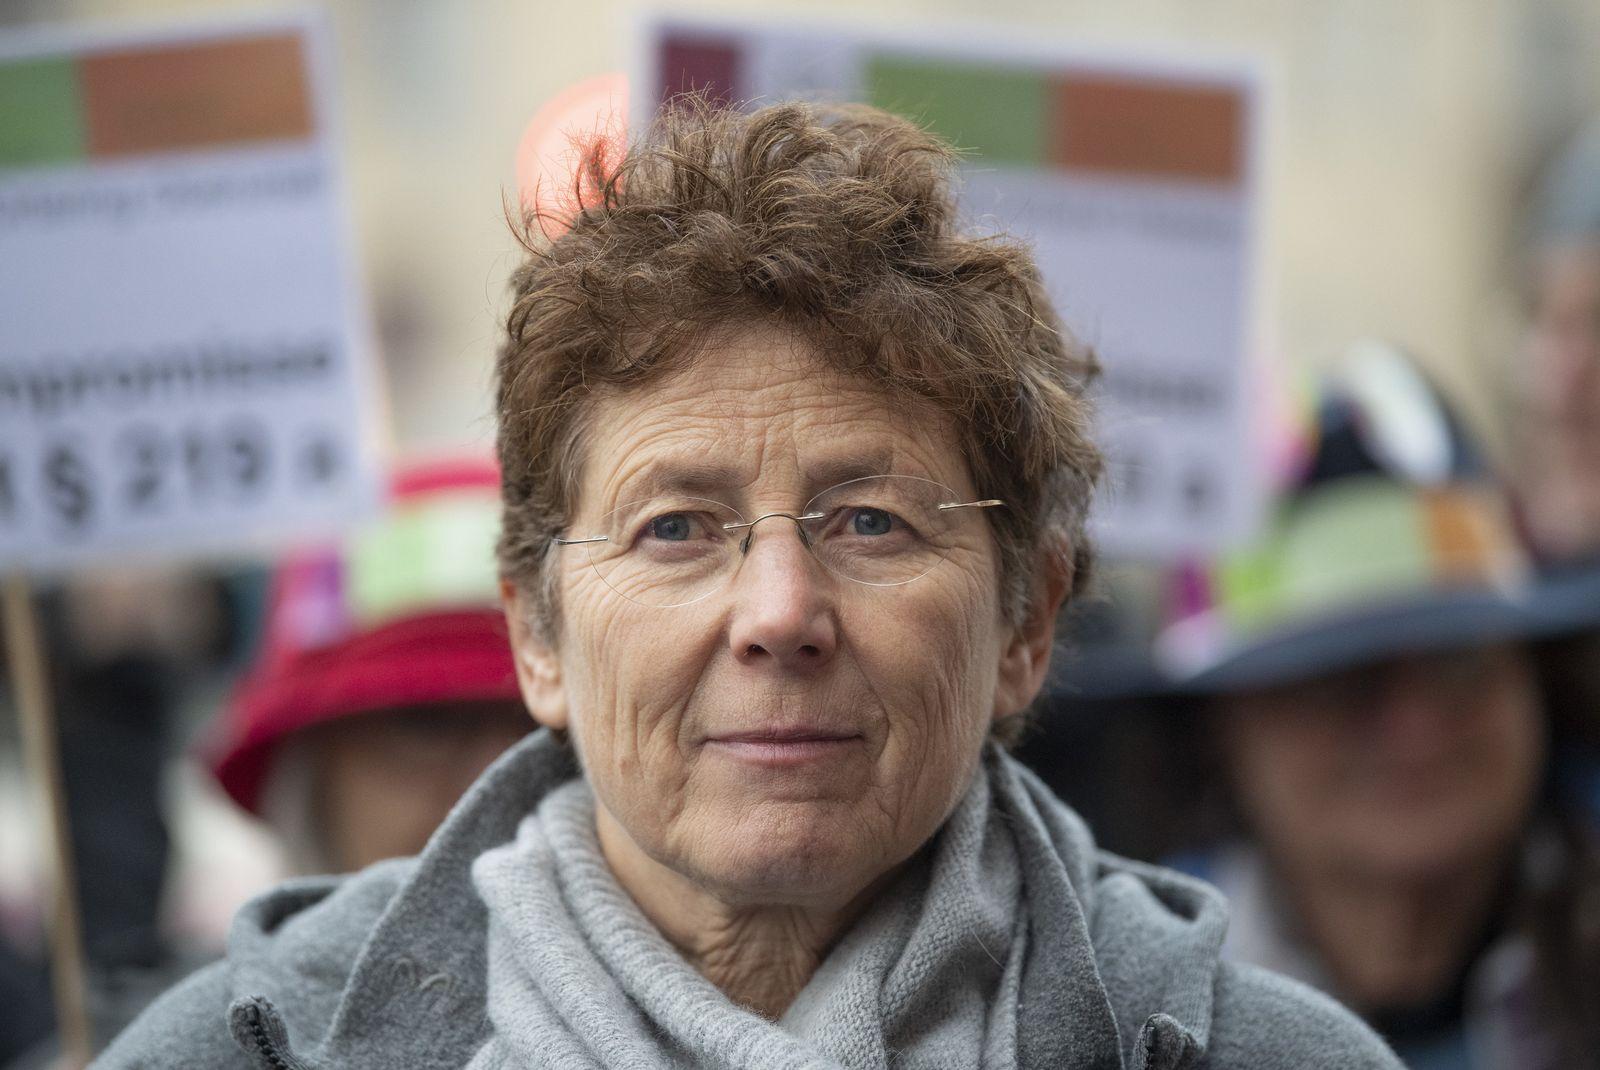 Kristina Hänel/ Landgericht